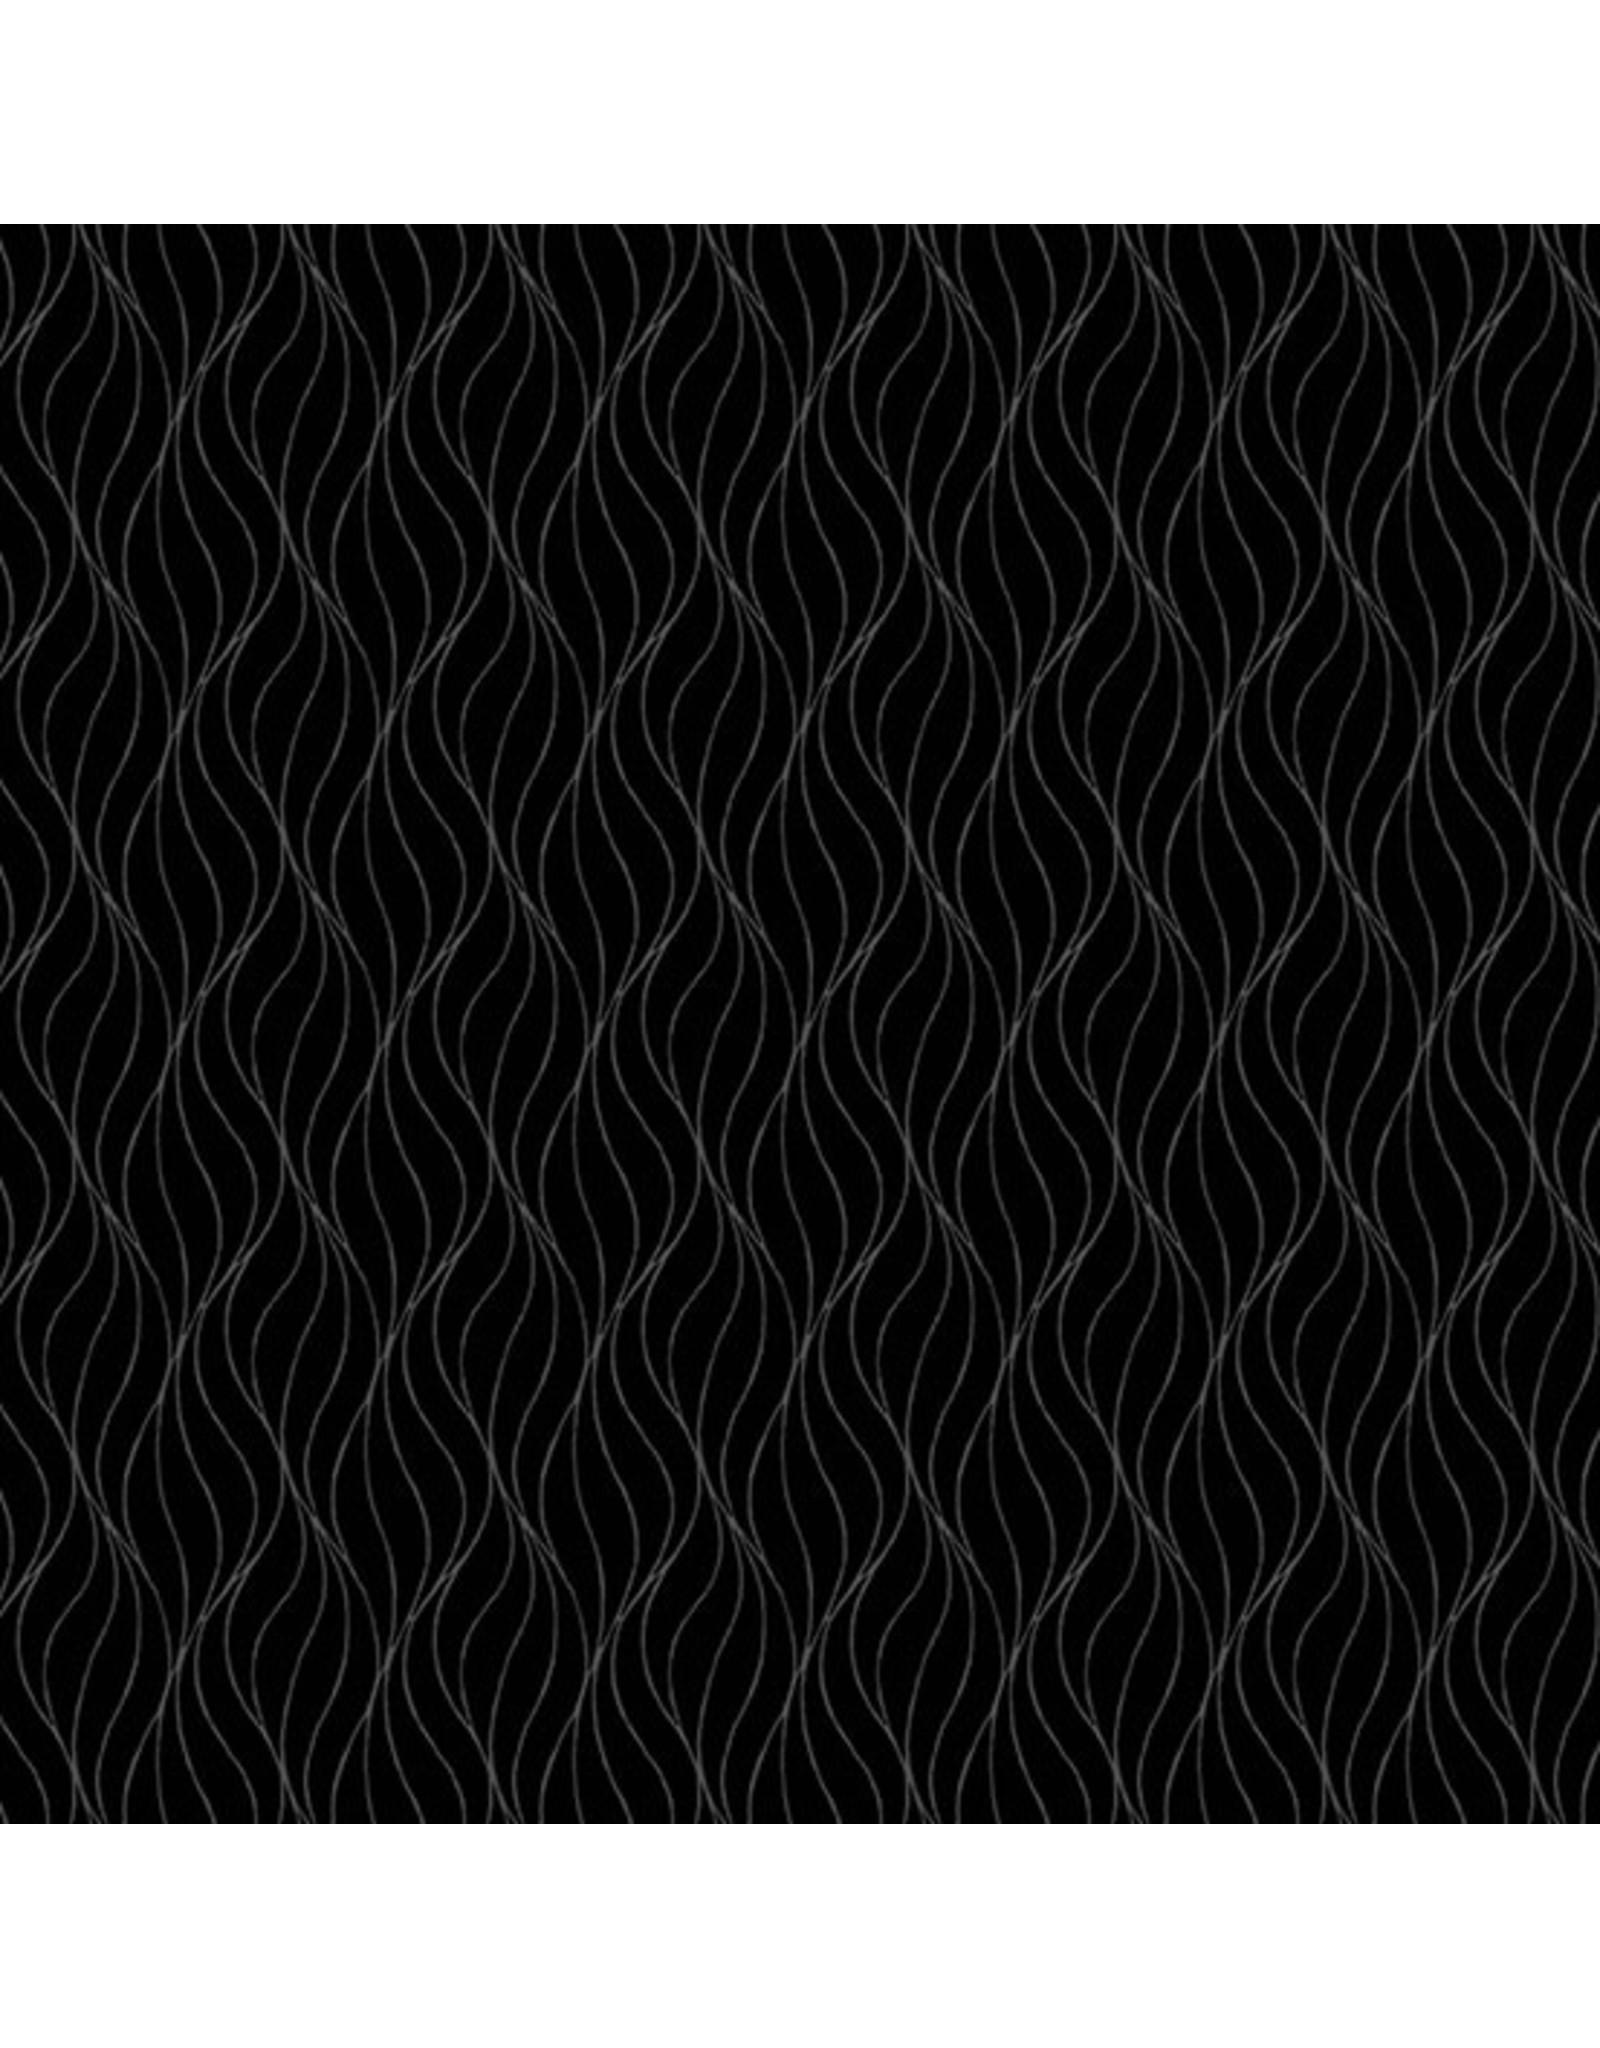 Andover Fabrics Century Solids Black on Black, Waves, Fabric Half-Yards